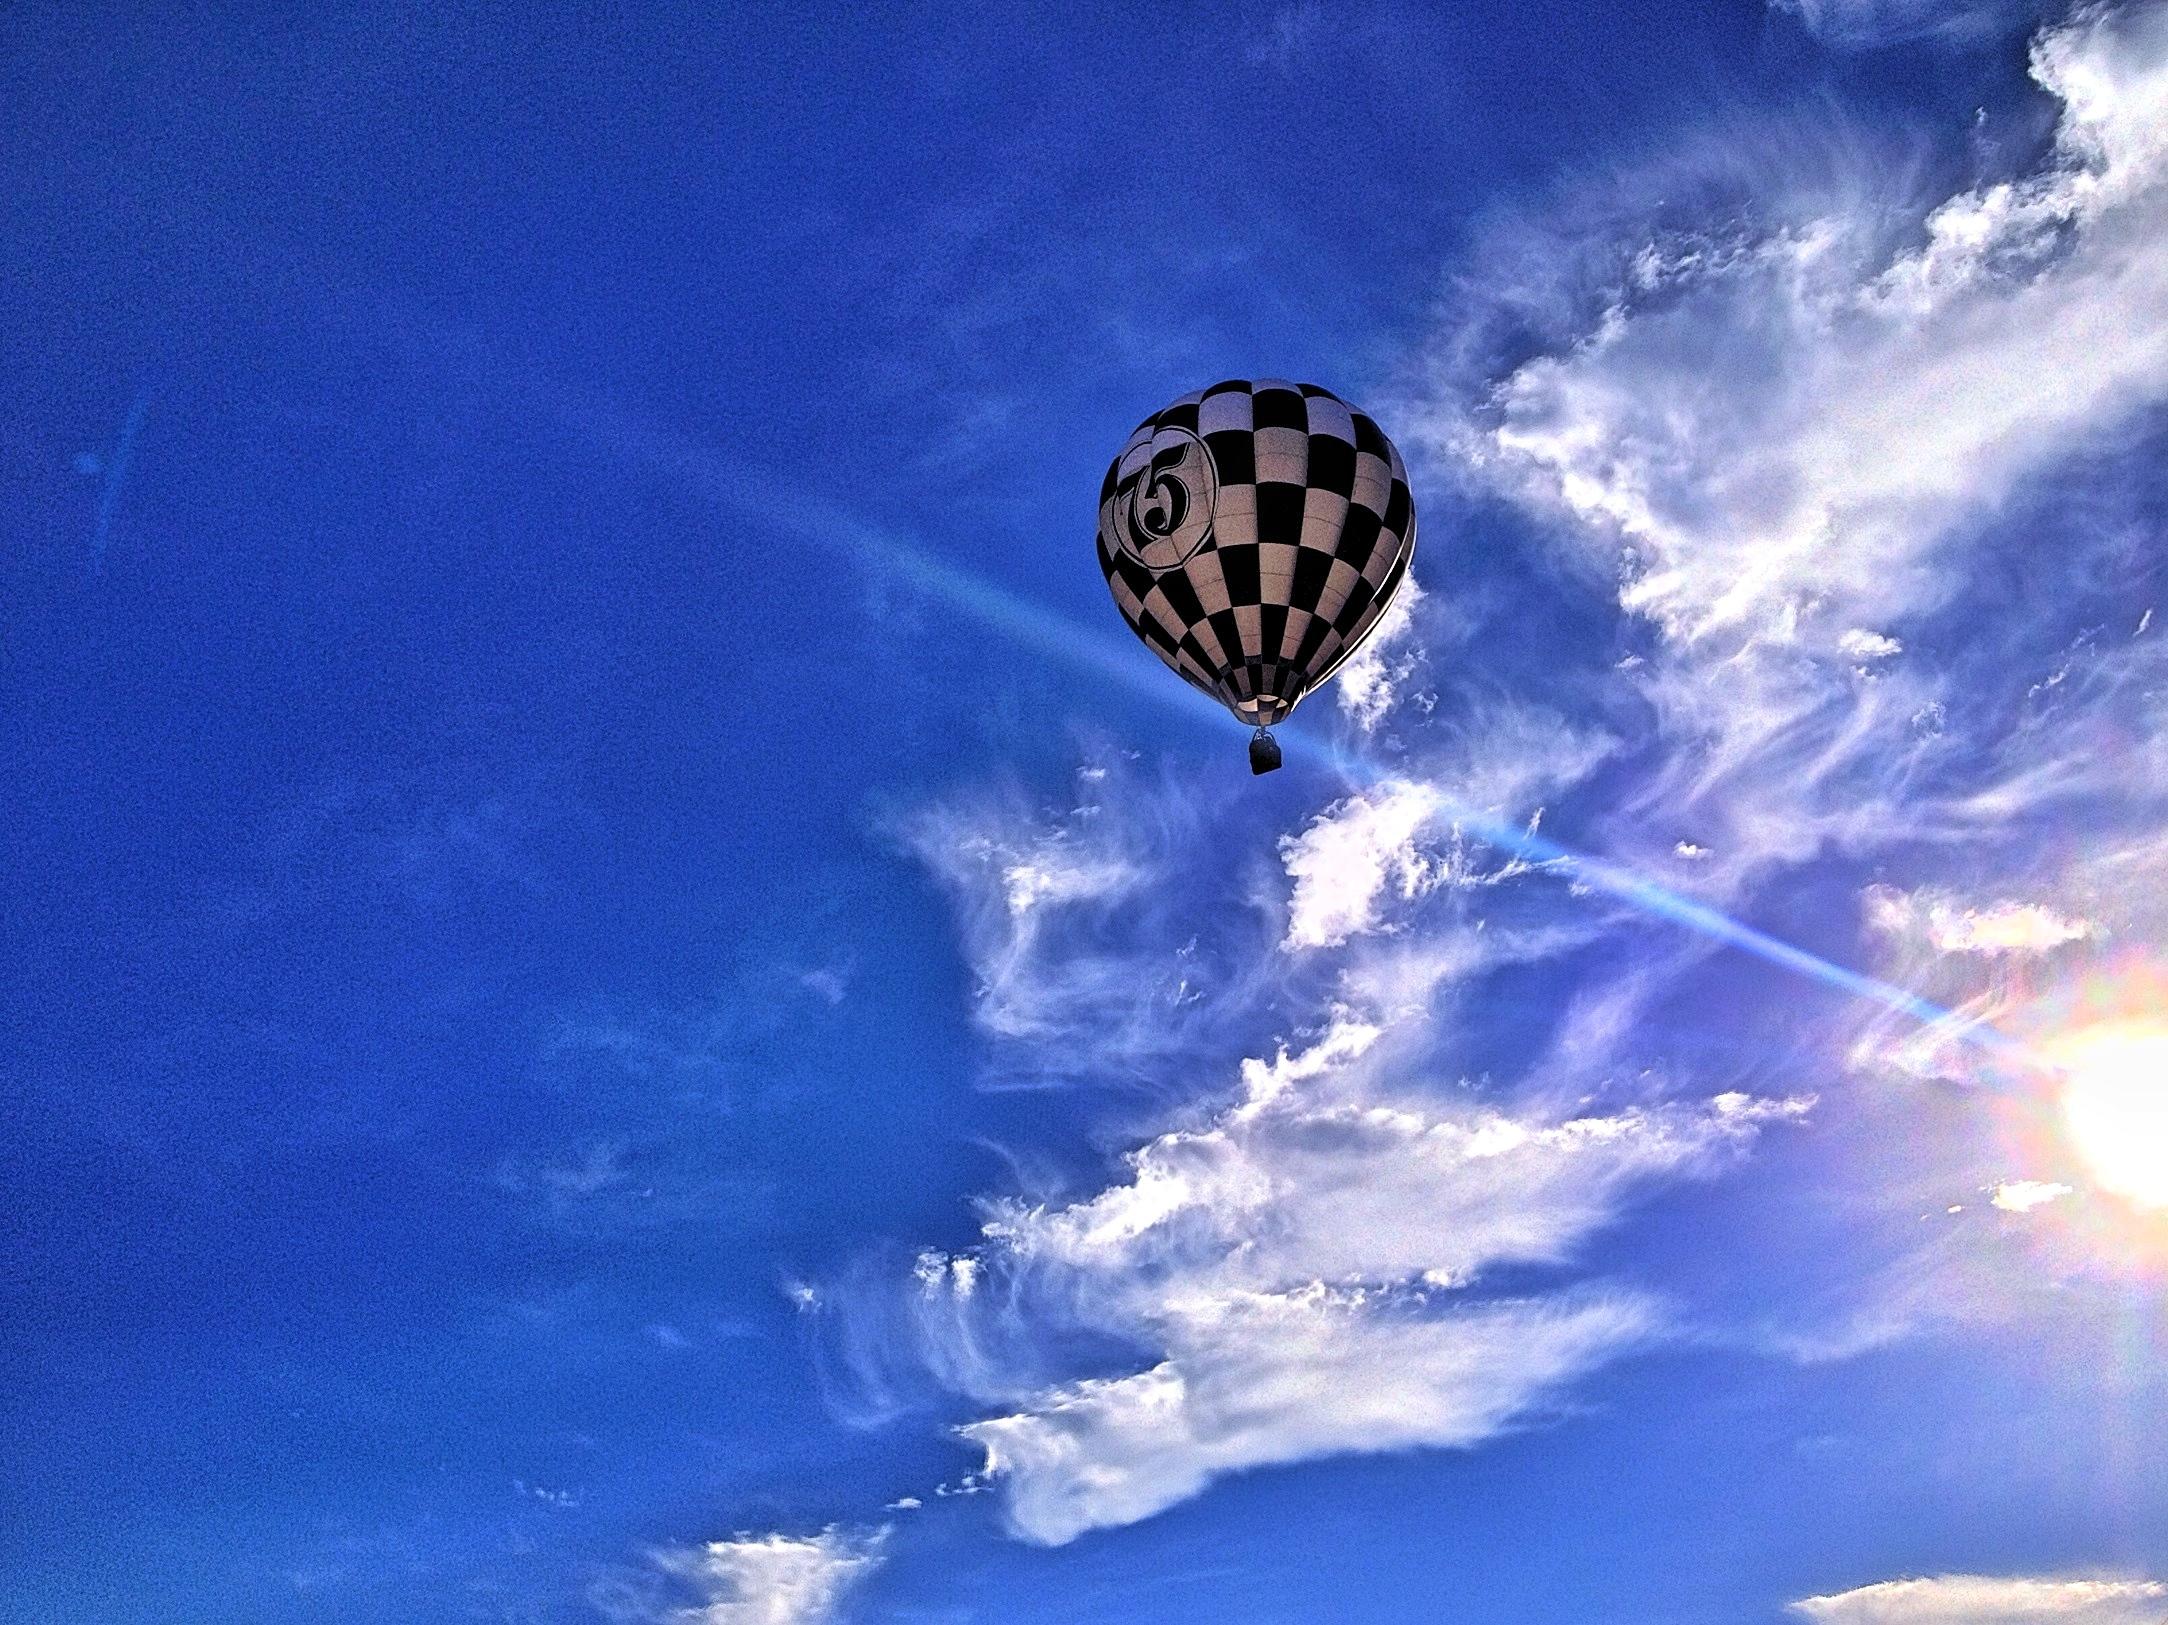 Wallpaper Blue Sky Sun White Black Sunshine Clouds Sunrise Ray Cloudy Nevada Balloon Nv Flare Hotairballoon Reno Ios Cloudporn Iphone 2014 Airballoon Renoballoonraces Greatrenoballoonrace Skyporn Ranchosanrafaelpark Iphone4s